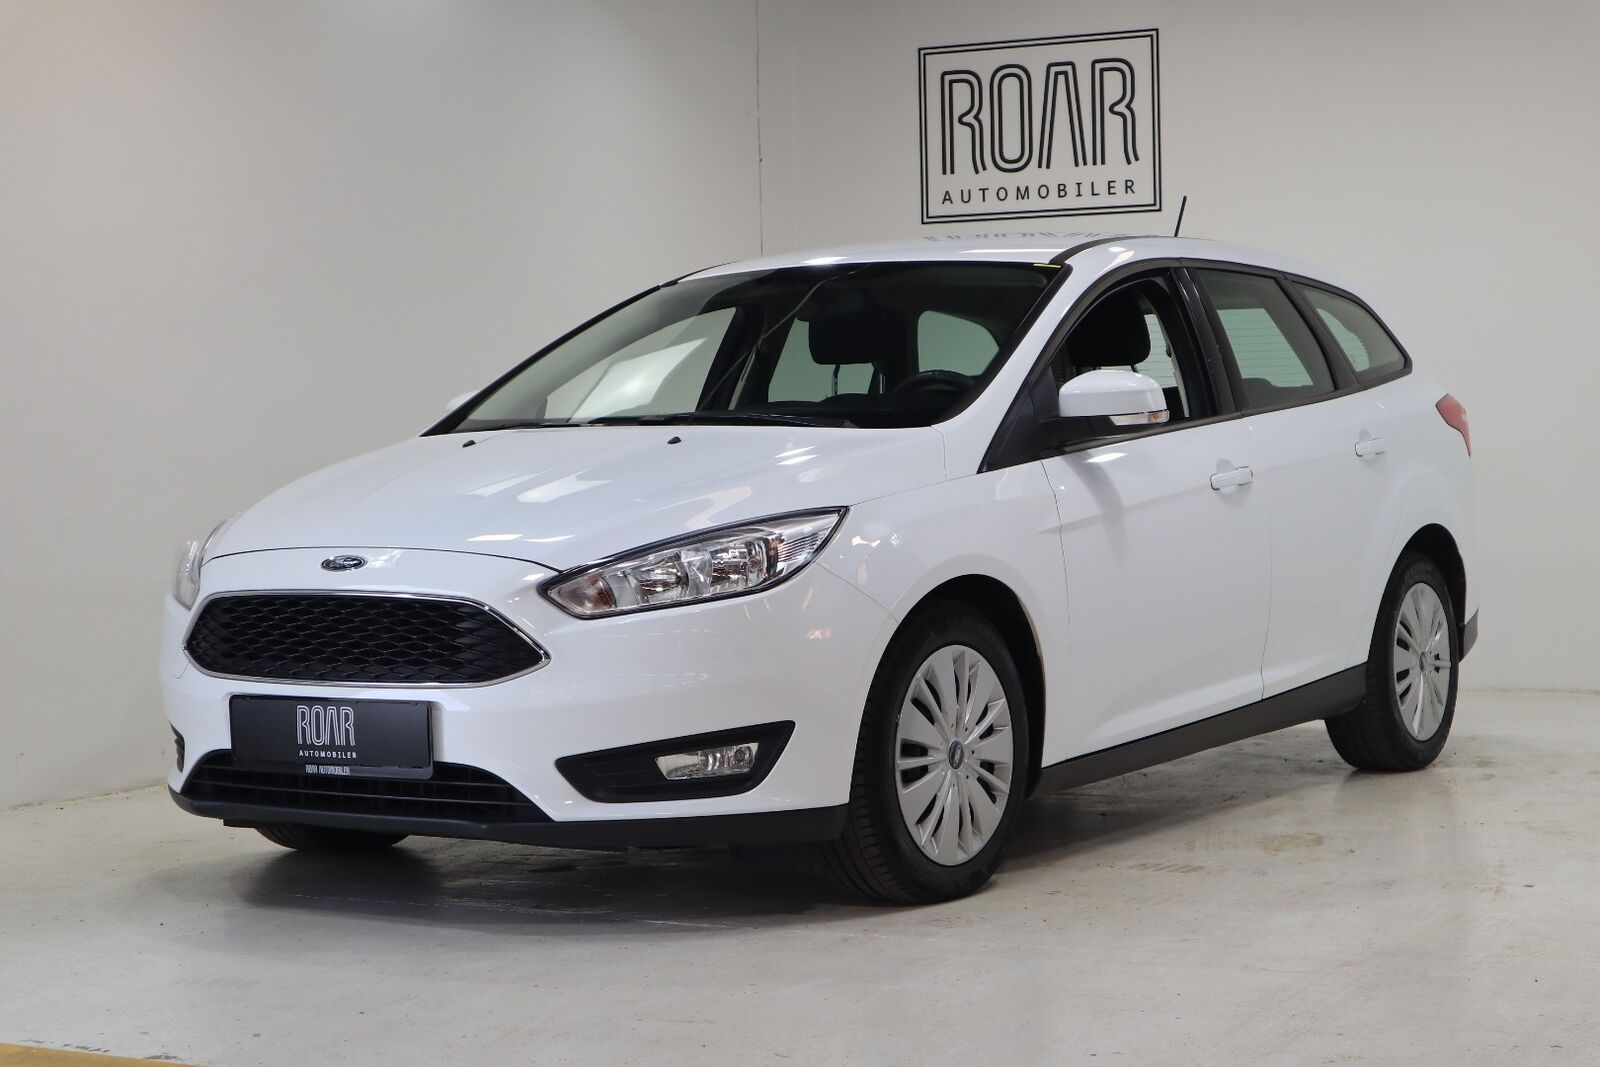 Ford Focus 1,5 TDCi 95 Business stc. 5d - 134.900 kr.